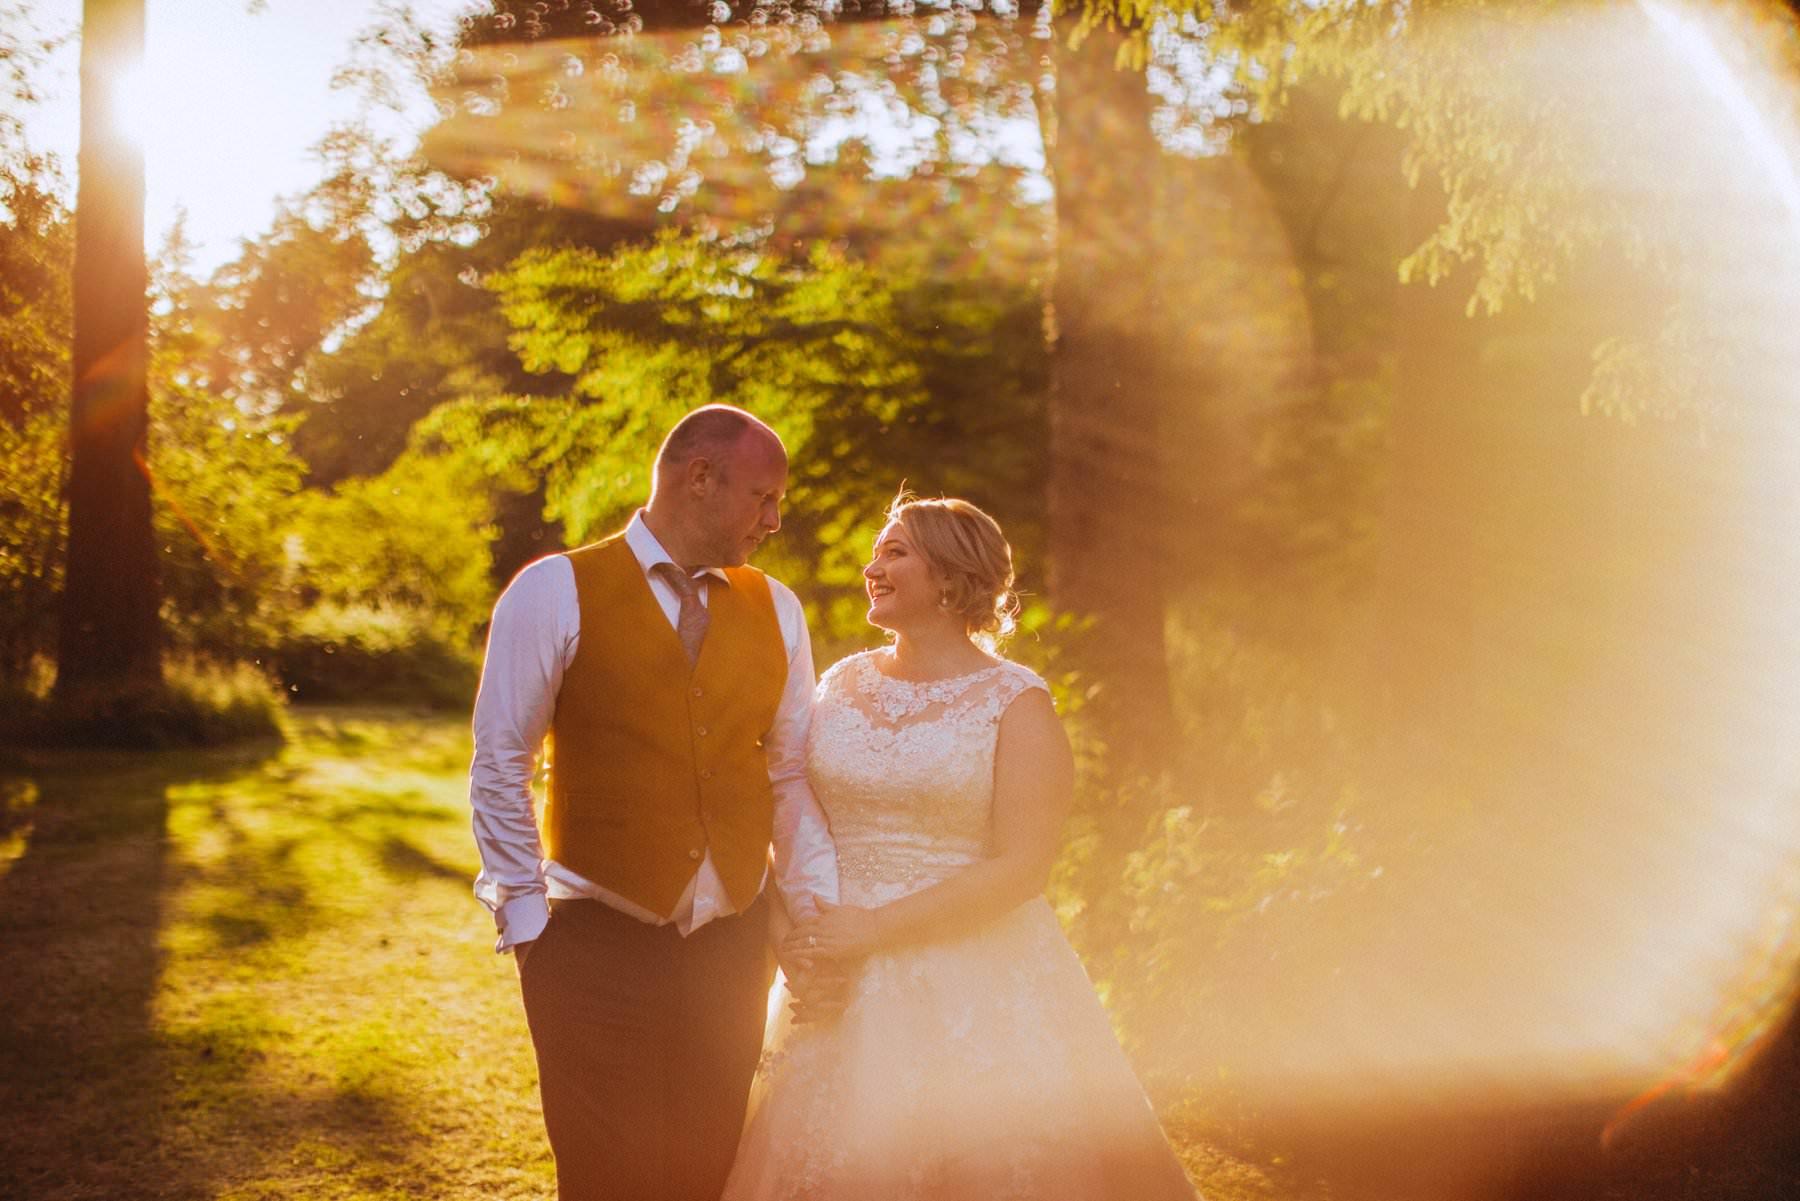 sunset wedding photography at larchfield northern ireland